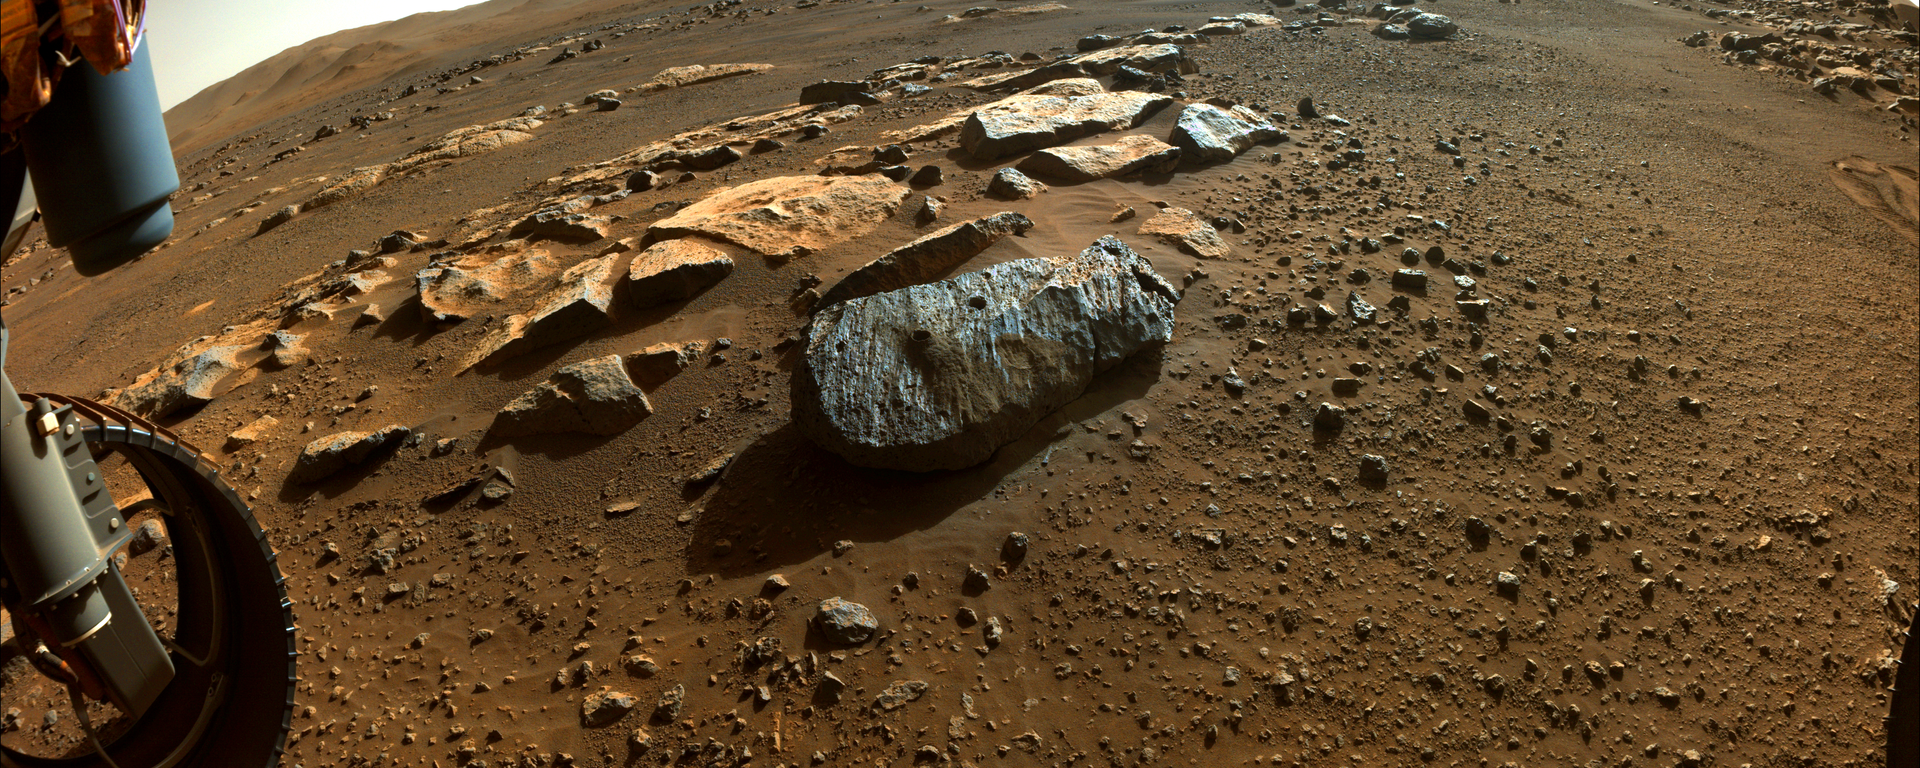 "Rover ""Perseverance"" auf dem Mars, der 8. September 2021  - SNA, 1920, 11.09.2021"